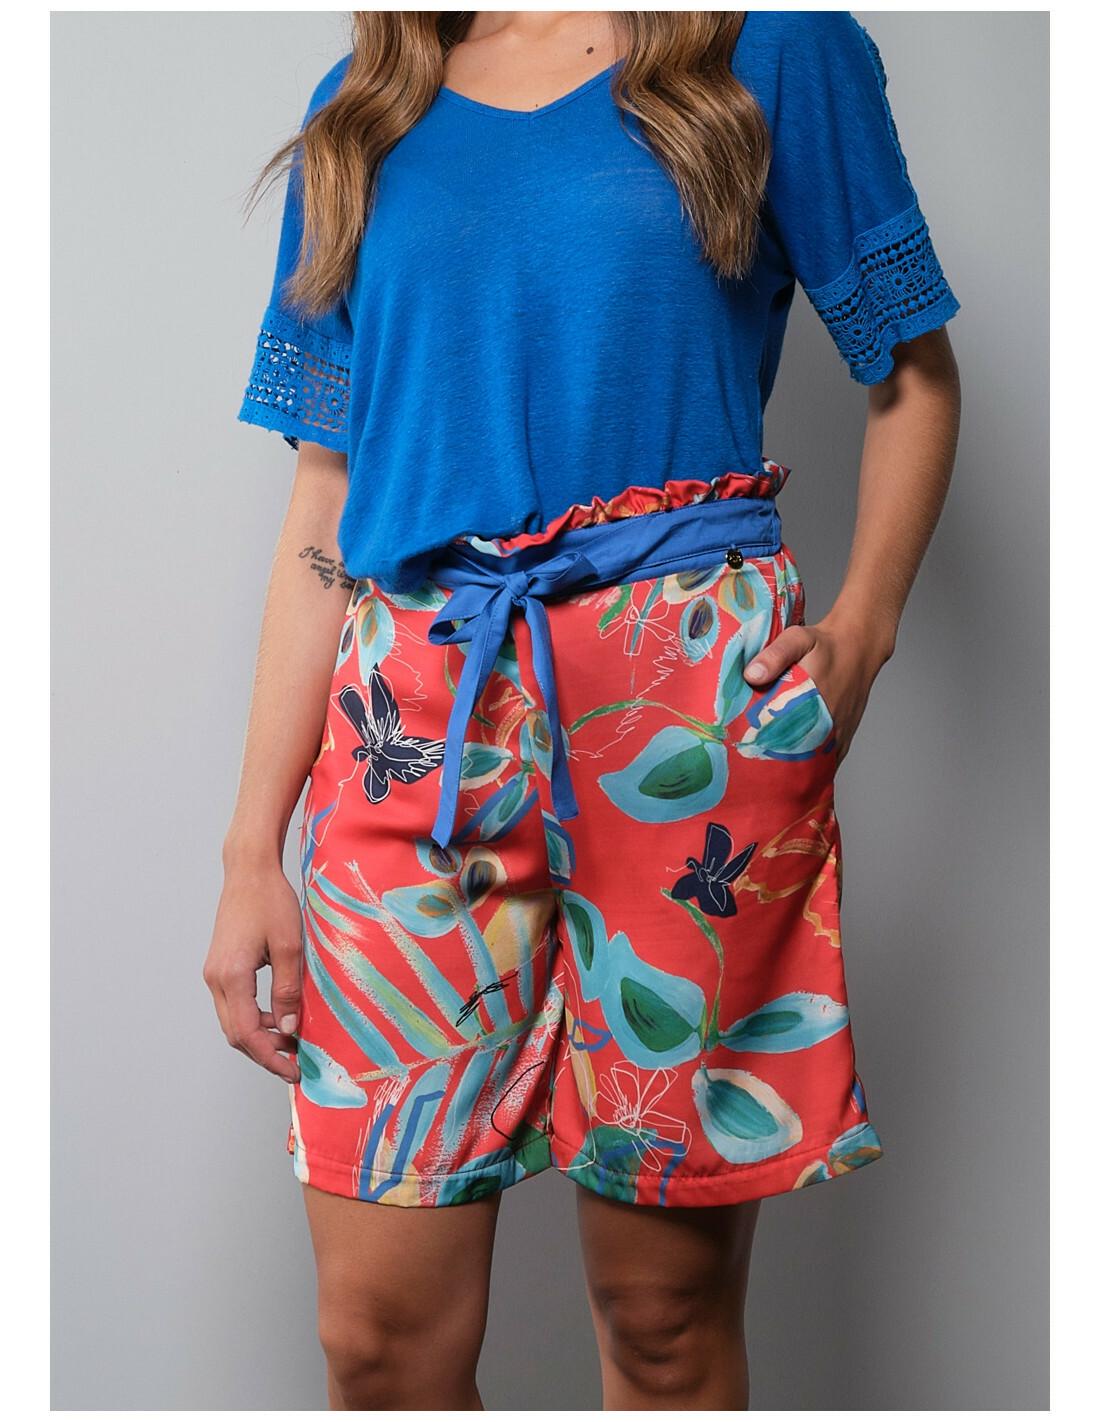 Paul Brial: Comfy Cool Hawaiian Frills Shorts PB_FRIVOLE_SOUFFLE